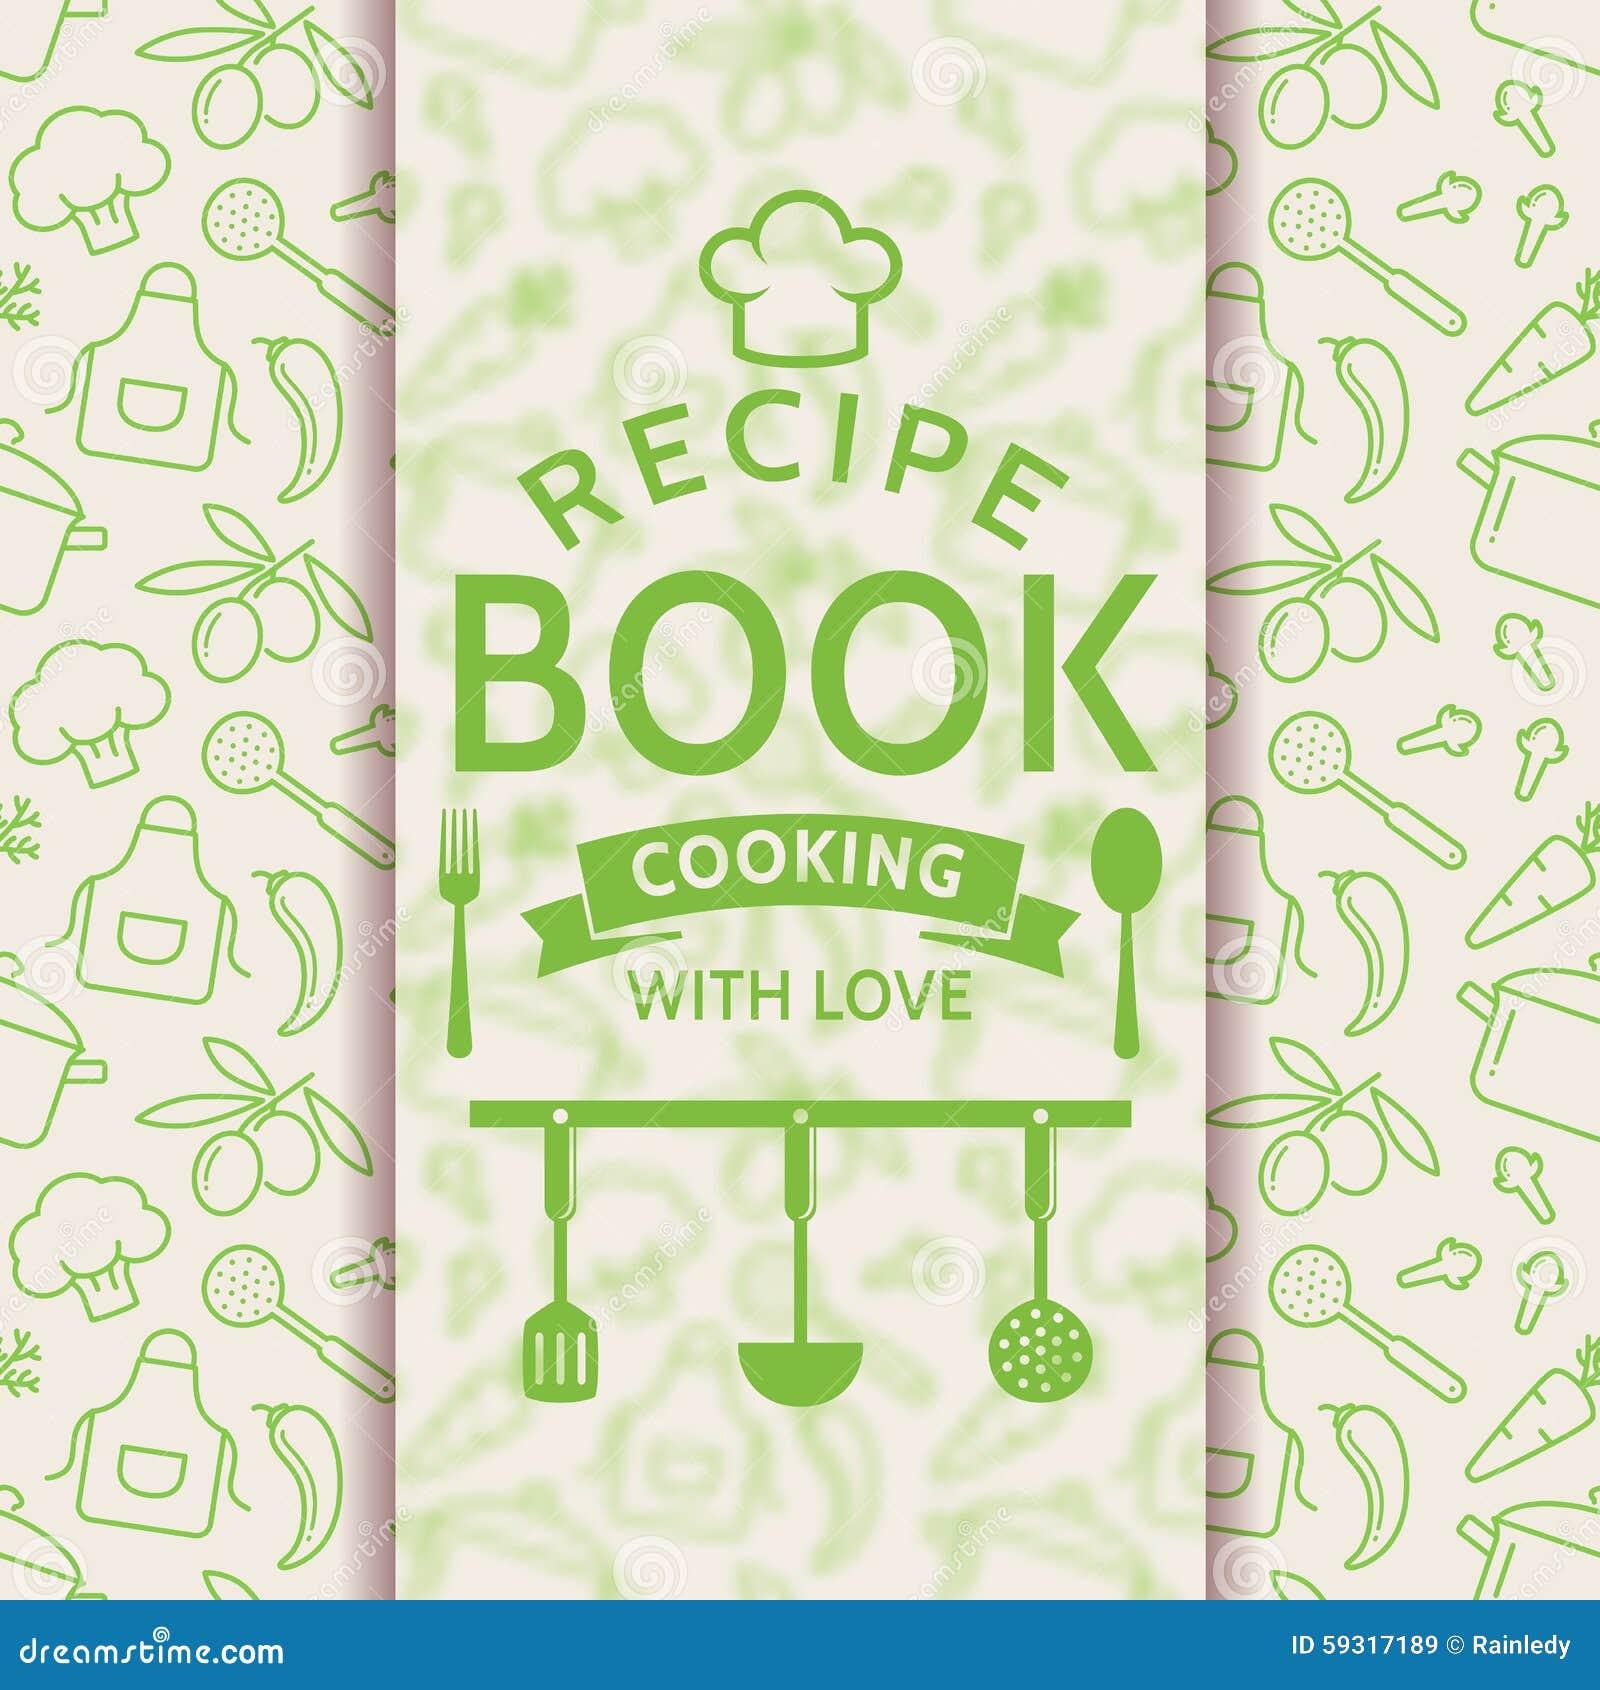 Recipe Book Vector Card Stock Illustration Of Design